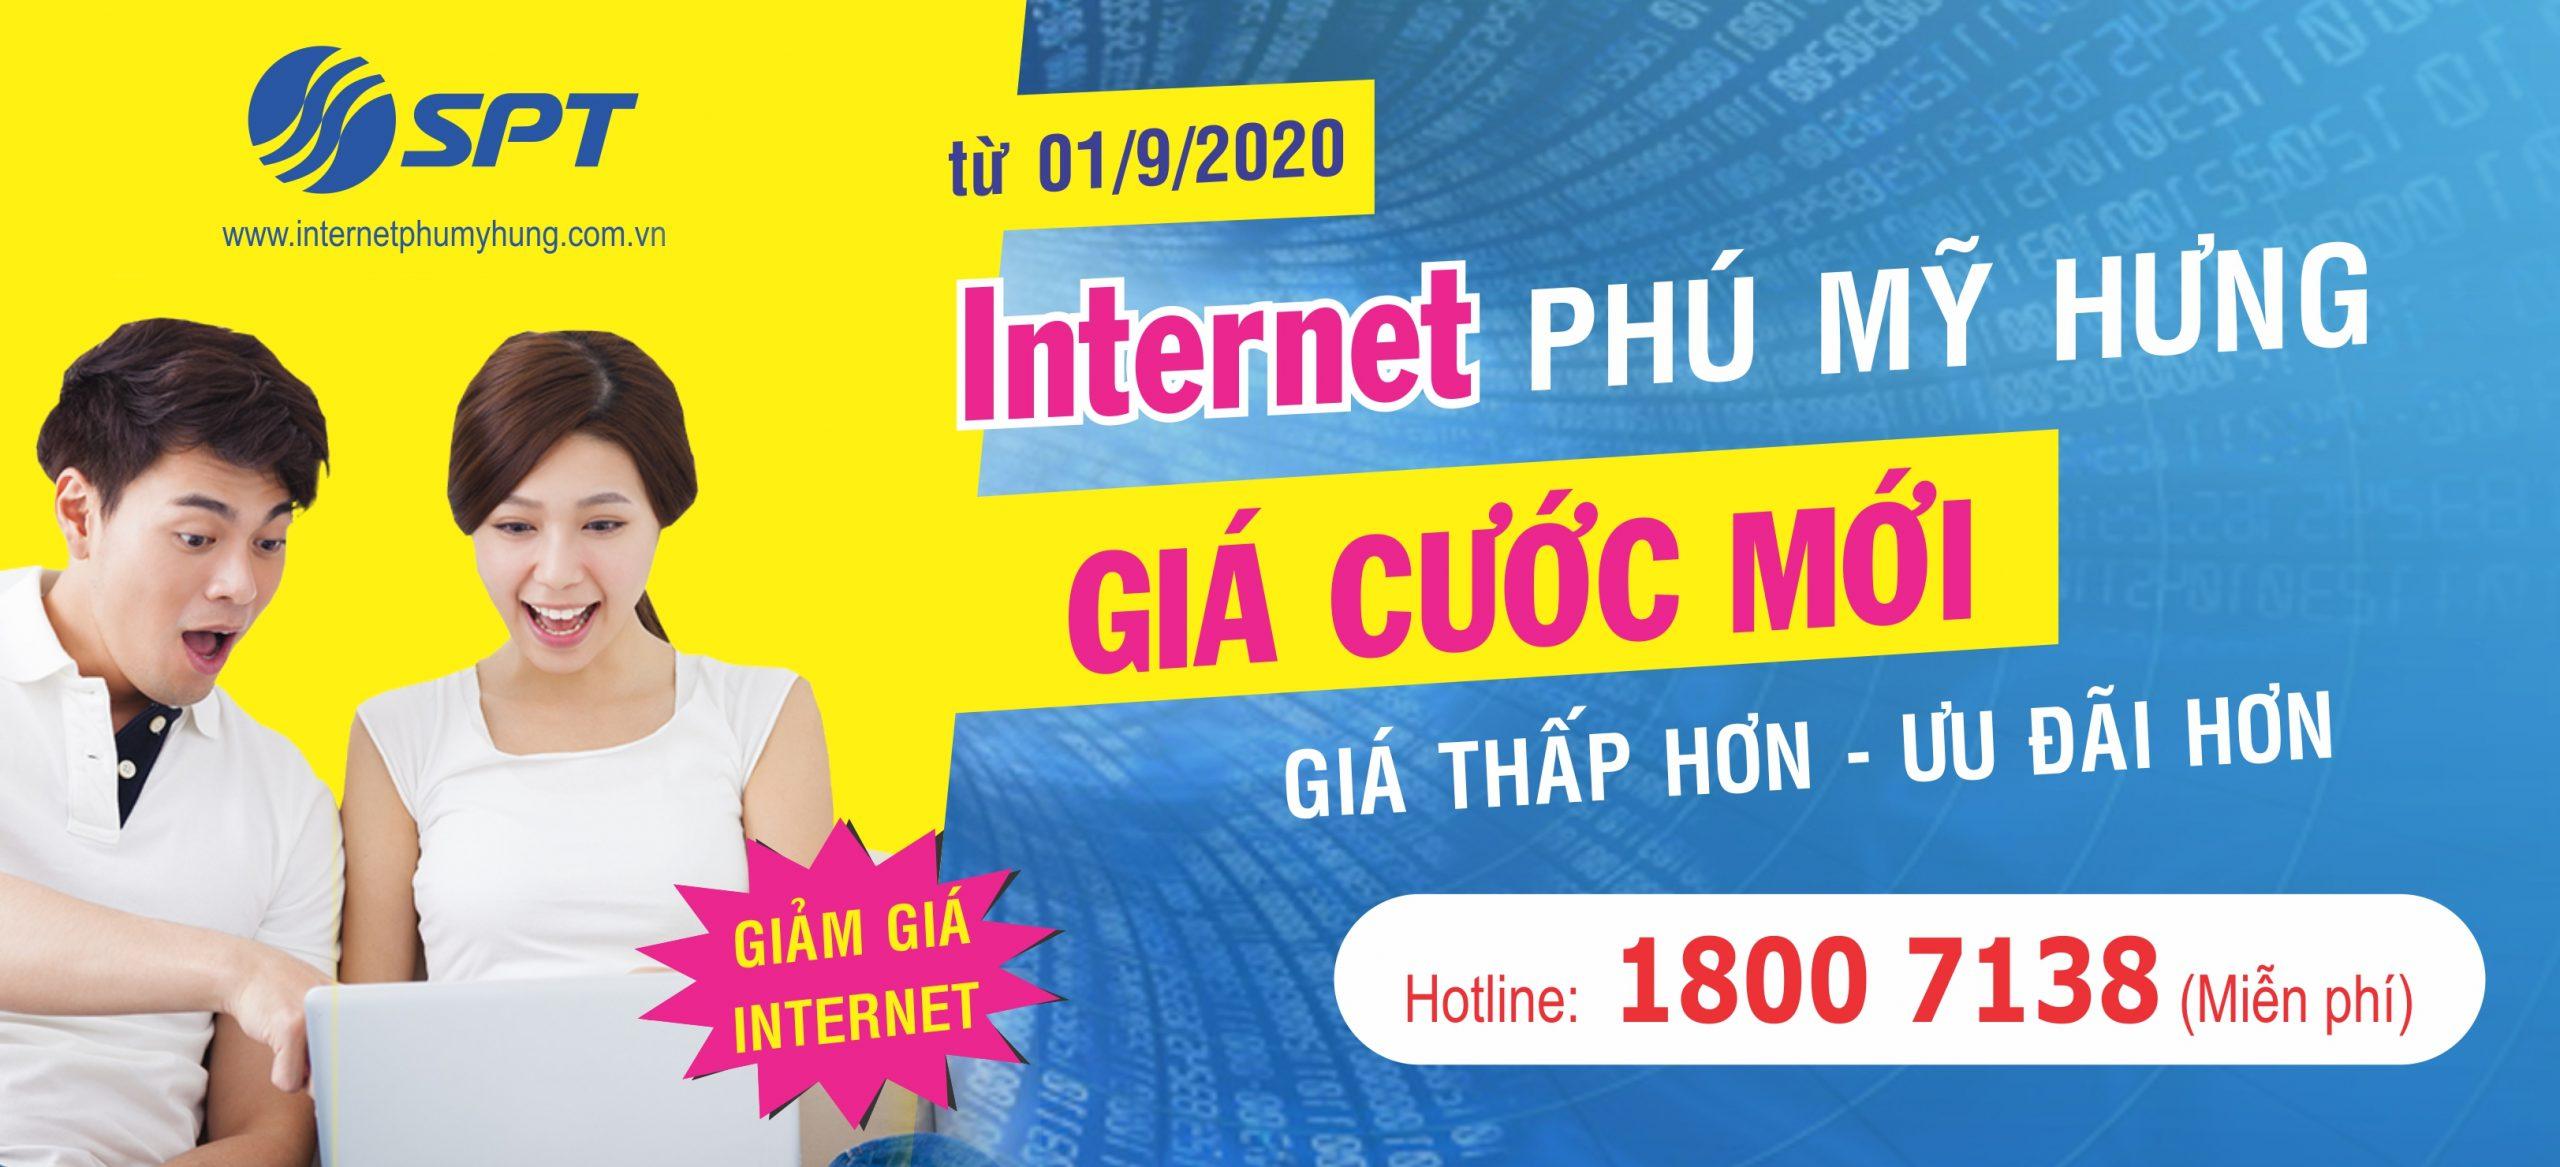 internet phu my hung - slide 1-25